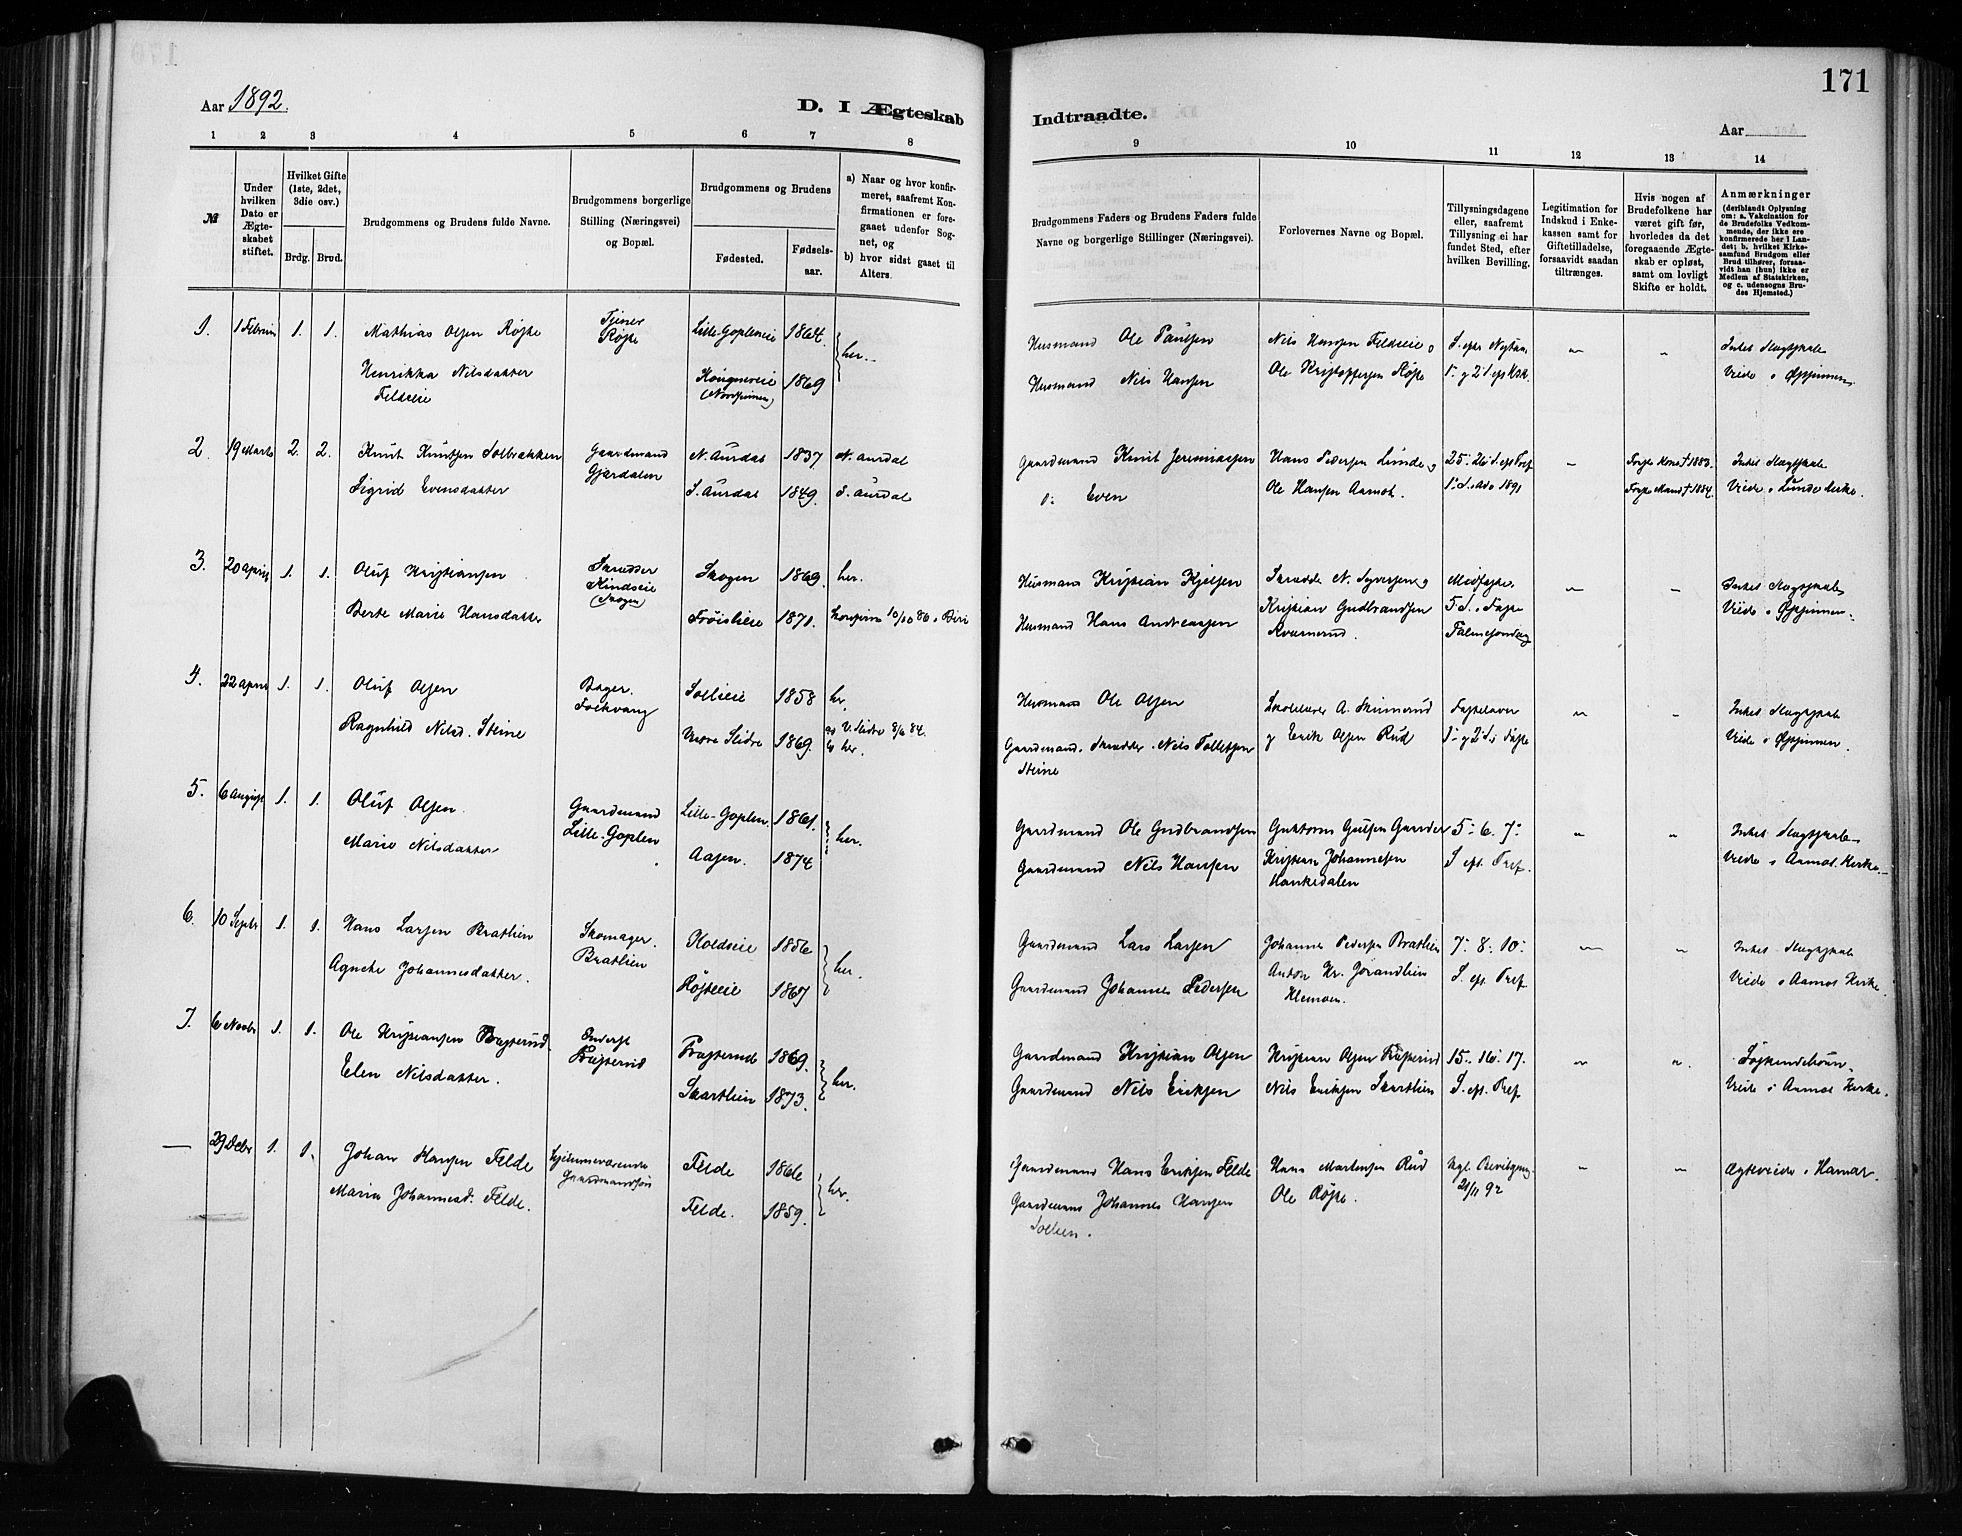 SAH, Nordre Land prestekontor, Ministerialbok nr. 4, 1882-1896, s. 171